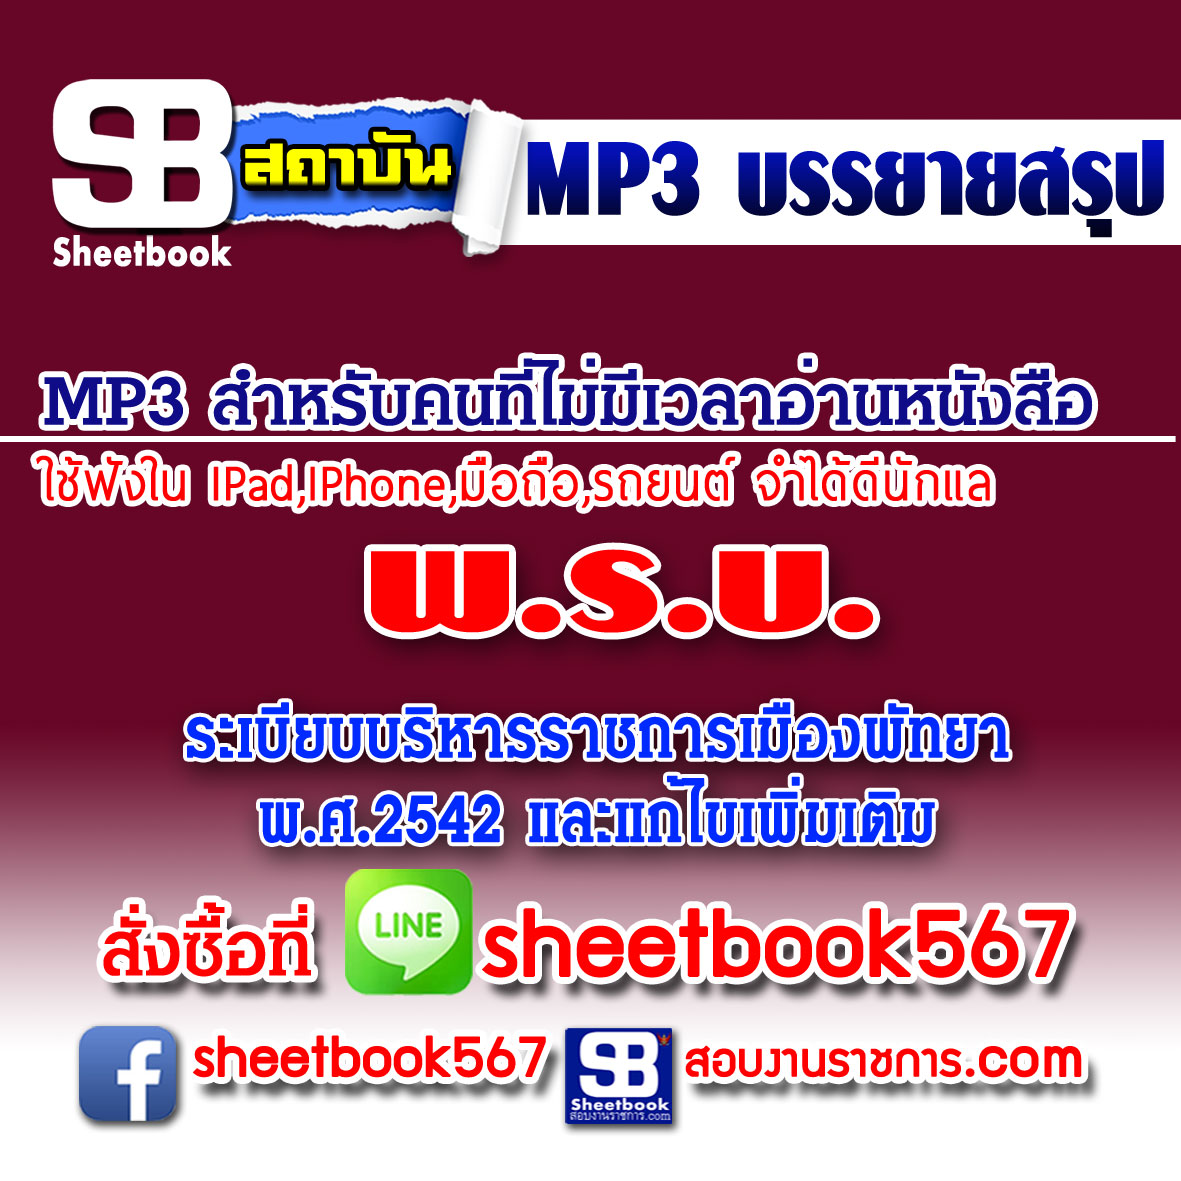 P032 - พระราชบัญญัติระเบียบบริหารราชการเมืองพัทยา พ.ศ. 2542